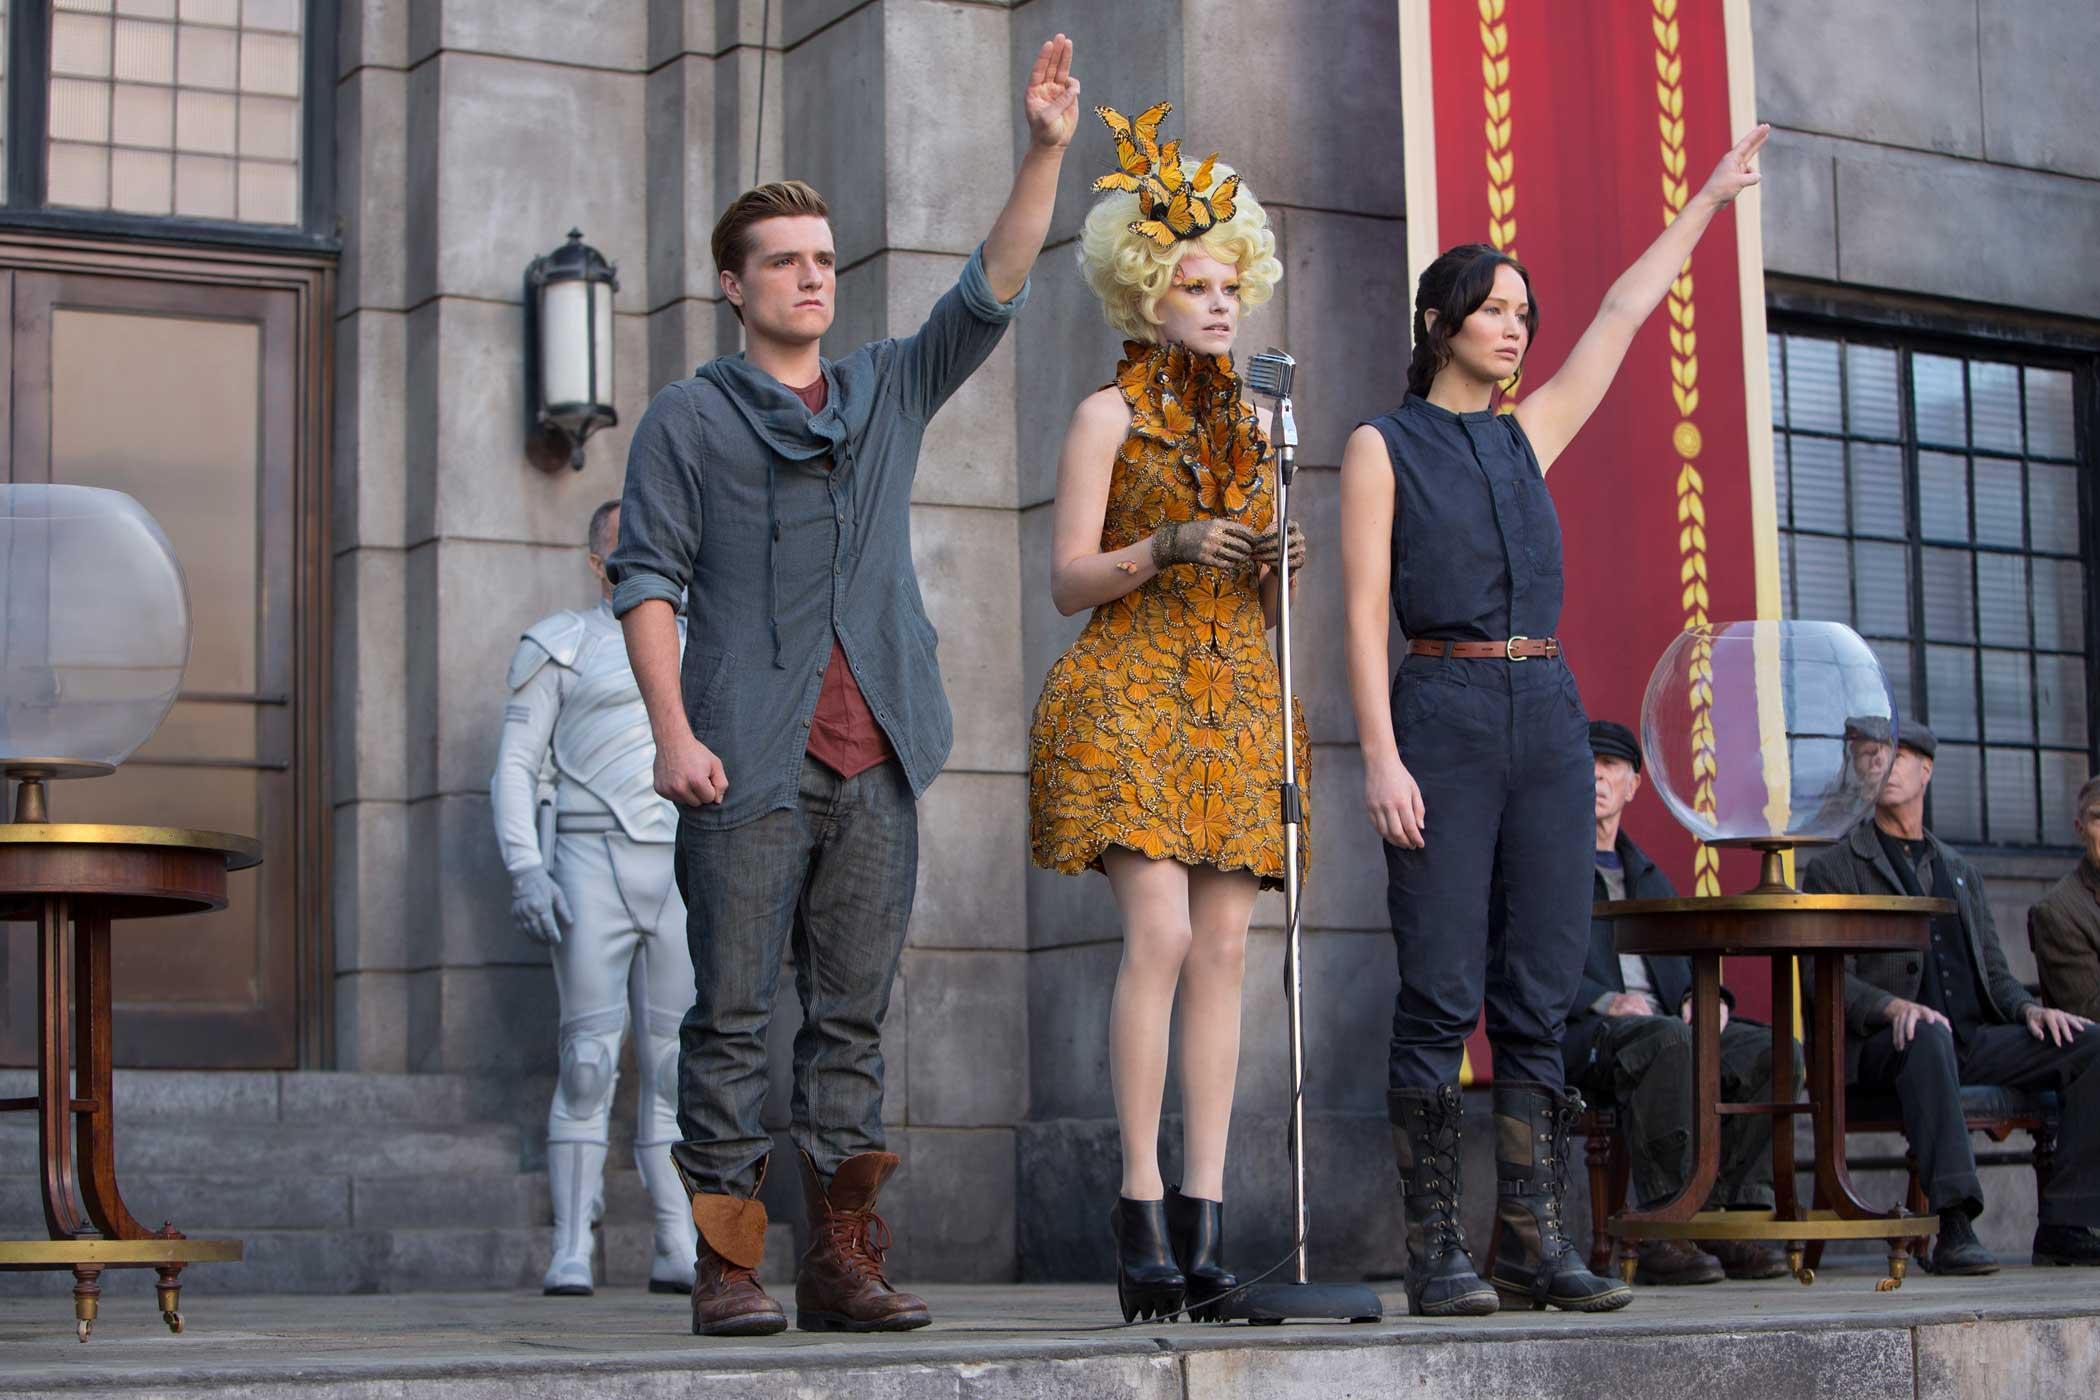 From left: Josh Hutcherson as Peeta Mellark, Elizabeth Banks as Effie Trinket, and Jennifer Lawrence as Katniss Everdeen in The Hunger Games: Catching Fire, 2013.